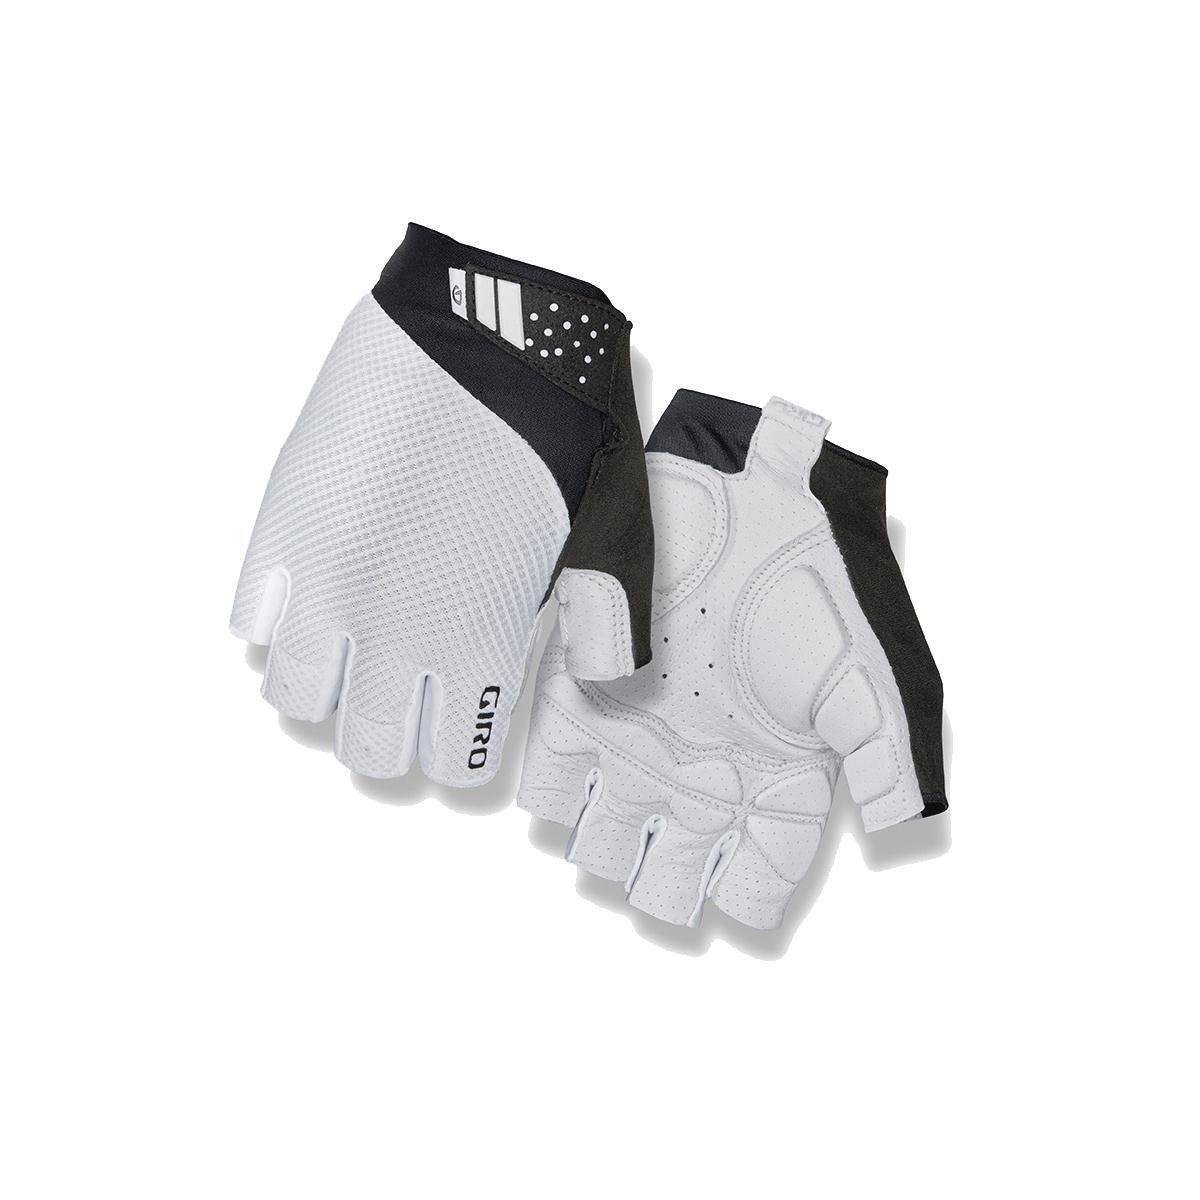 Cycling Gloves Fingerless Giro Monaco 2 2 Monaco Gel Road Cycling Mitt 2017 Weiß 2XL d2858e